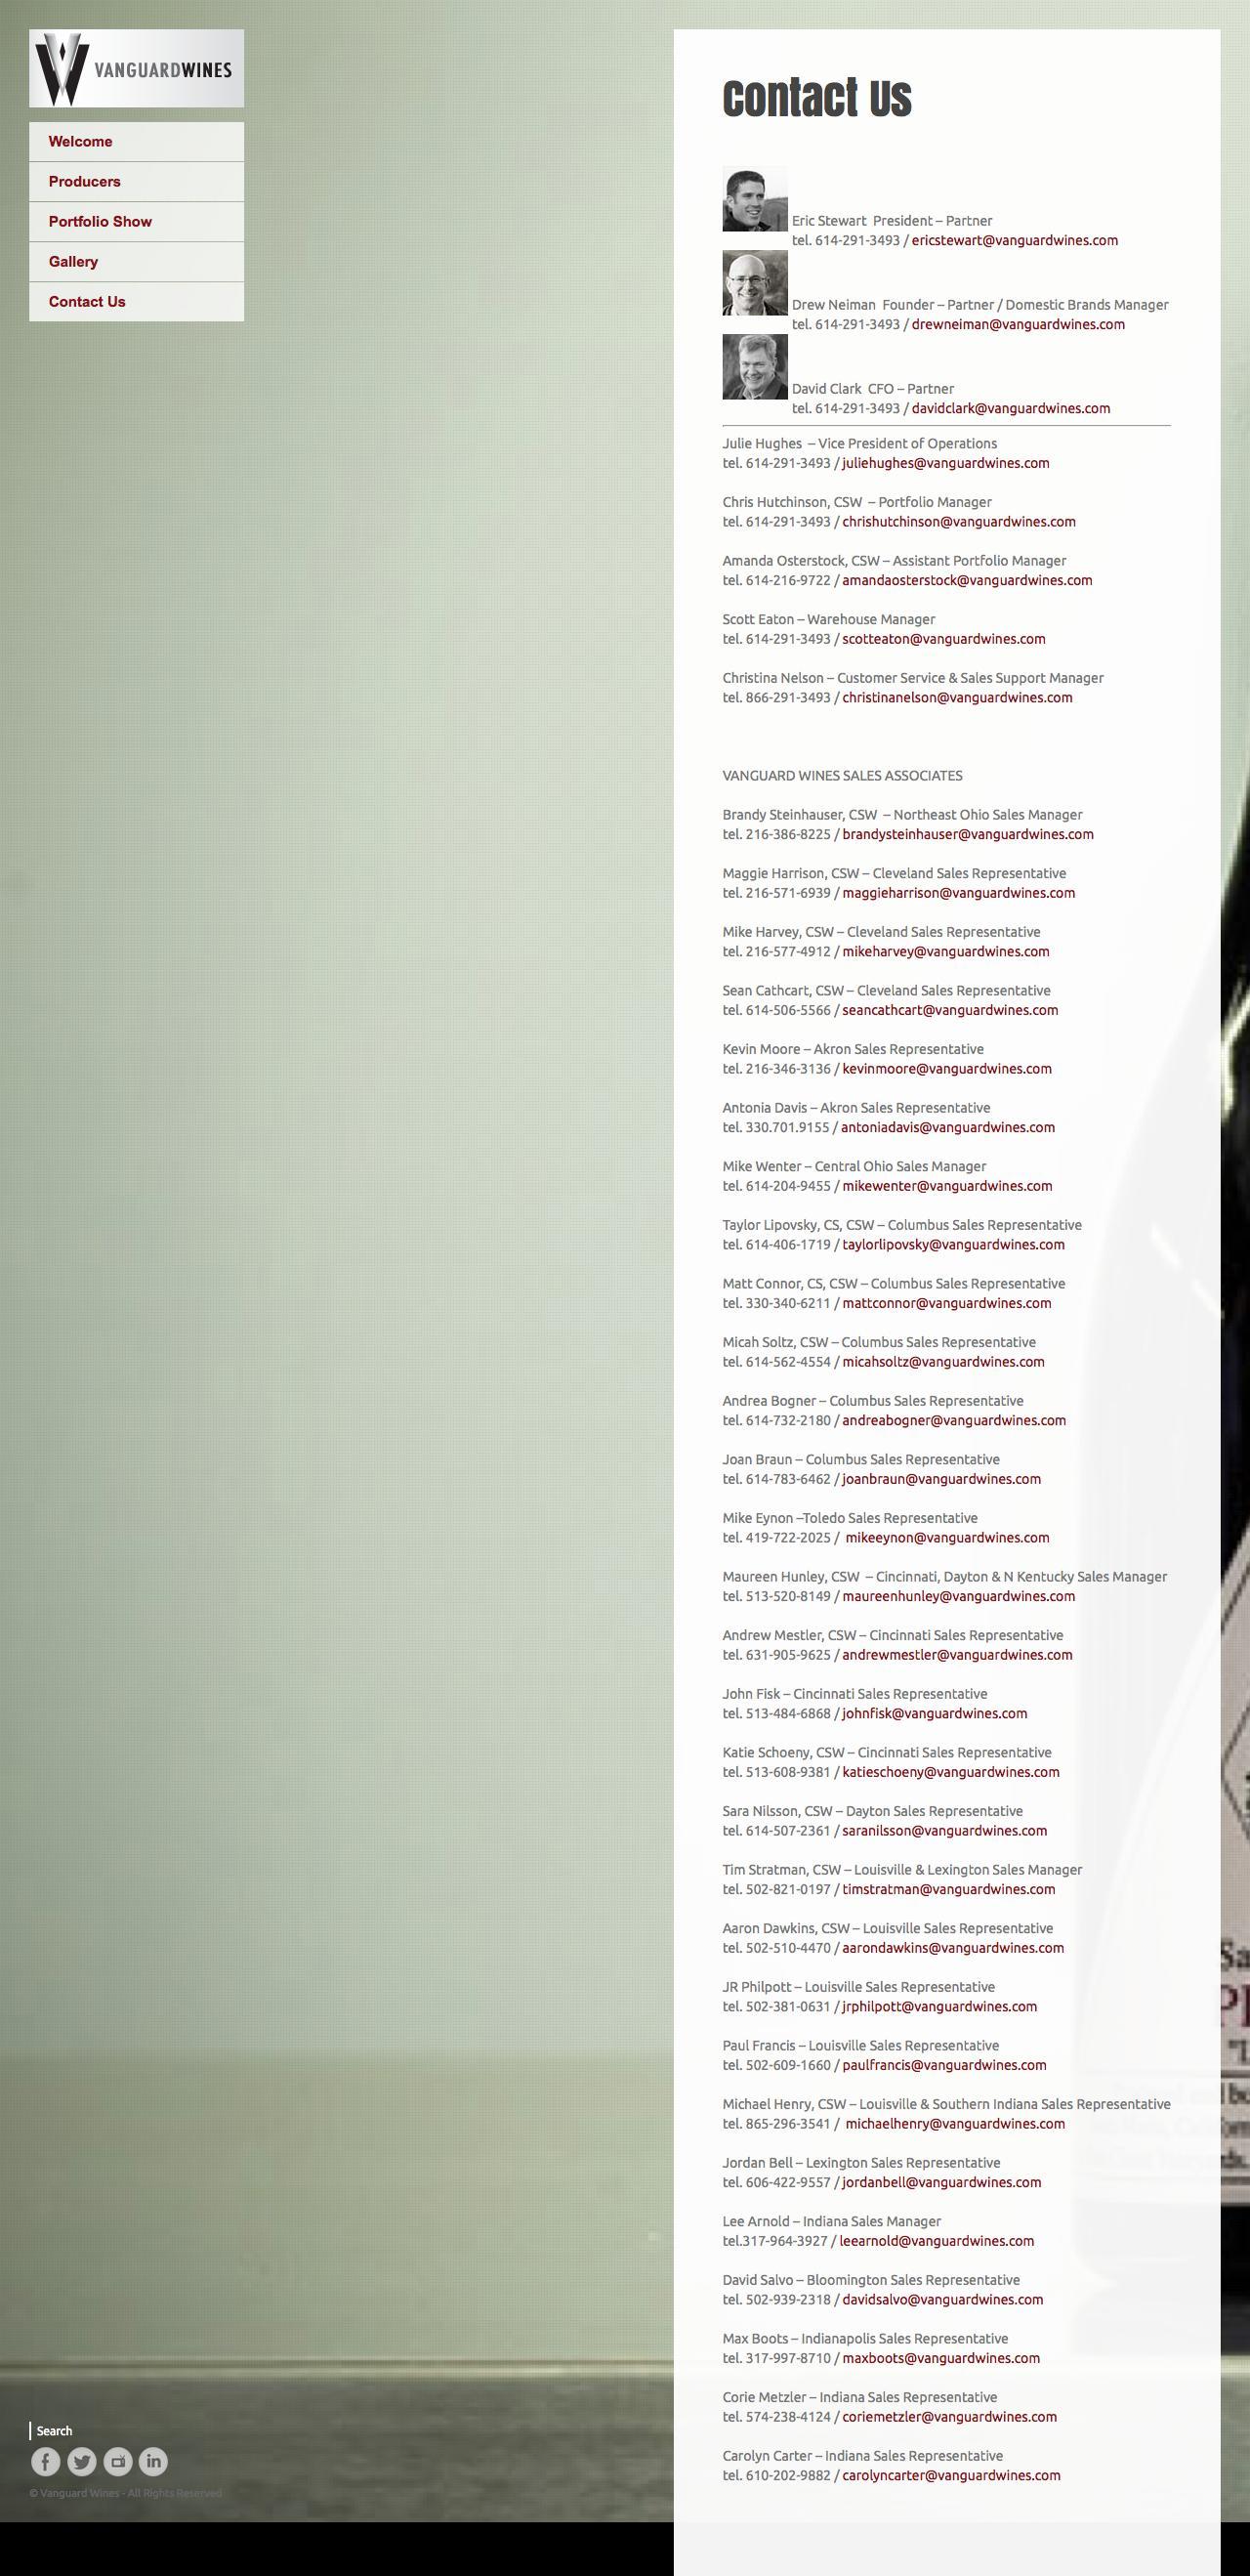 Web Design Example | A page on vanguardwines.com | Crayon